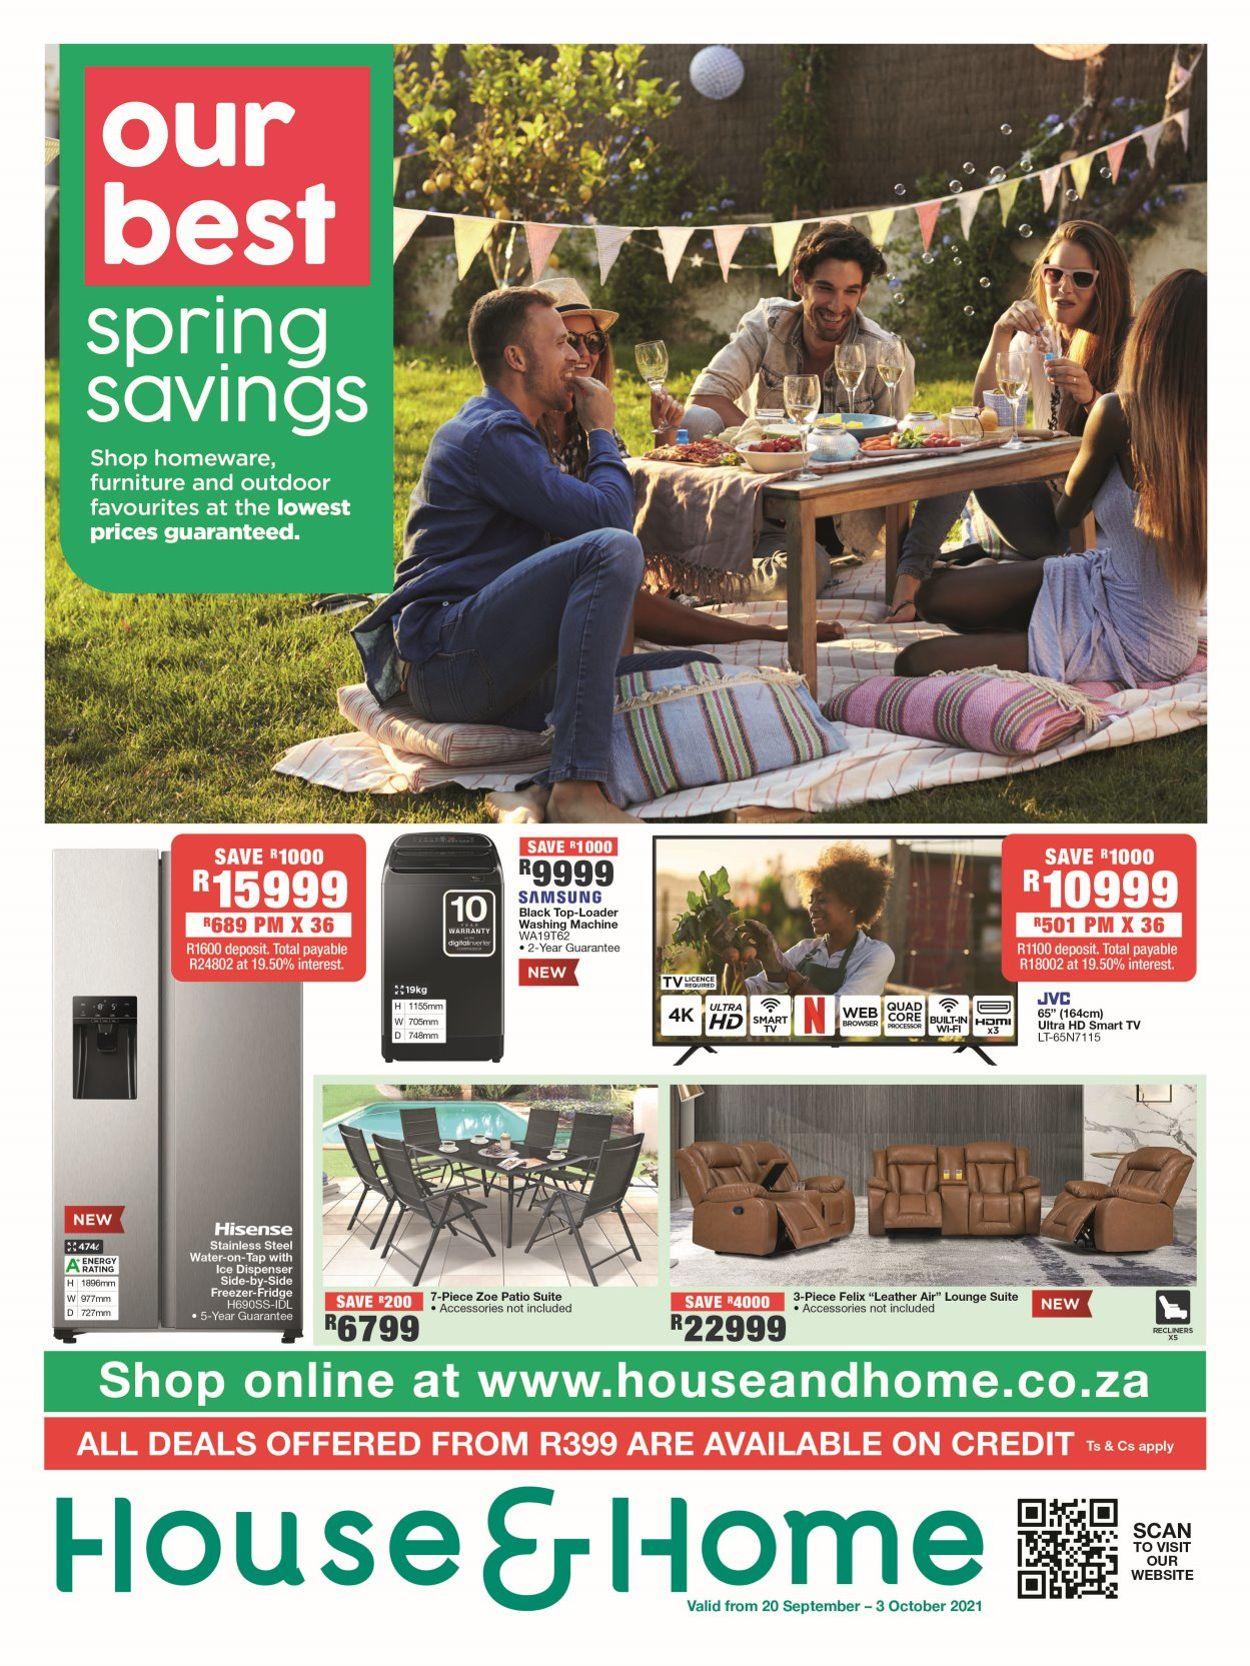 House & Home Catalogue - 2021/09/20-2021/10/03